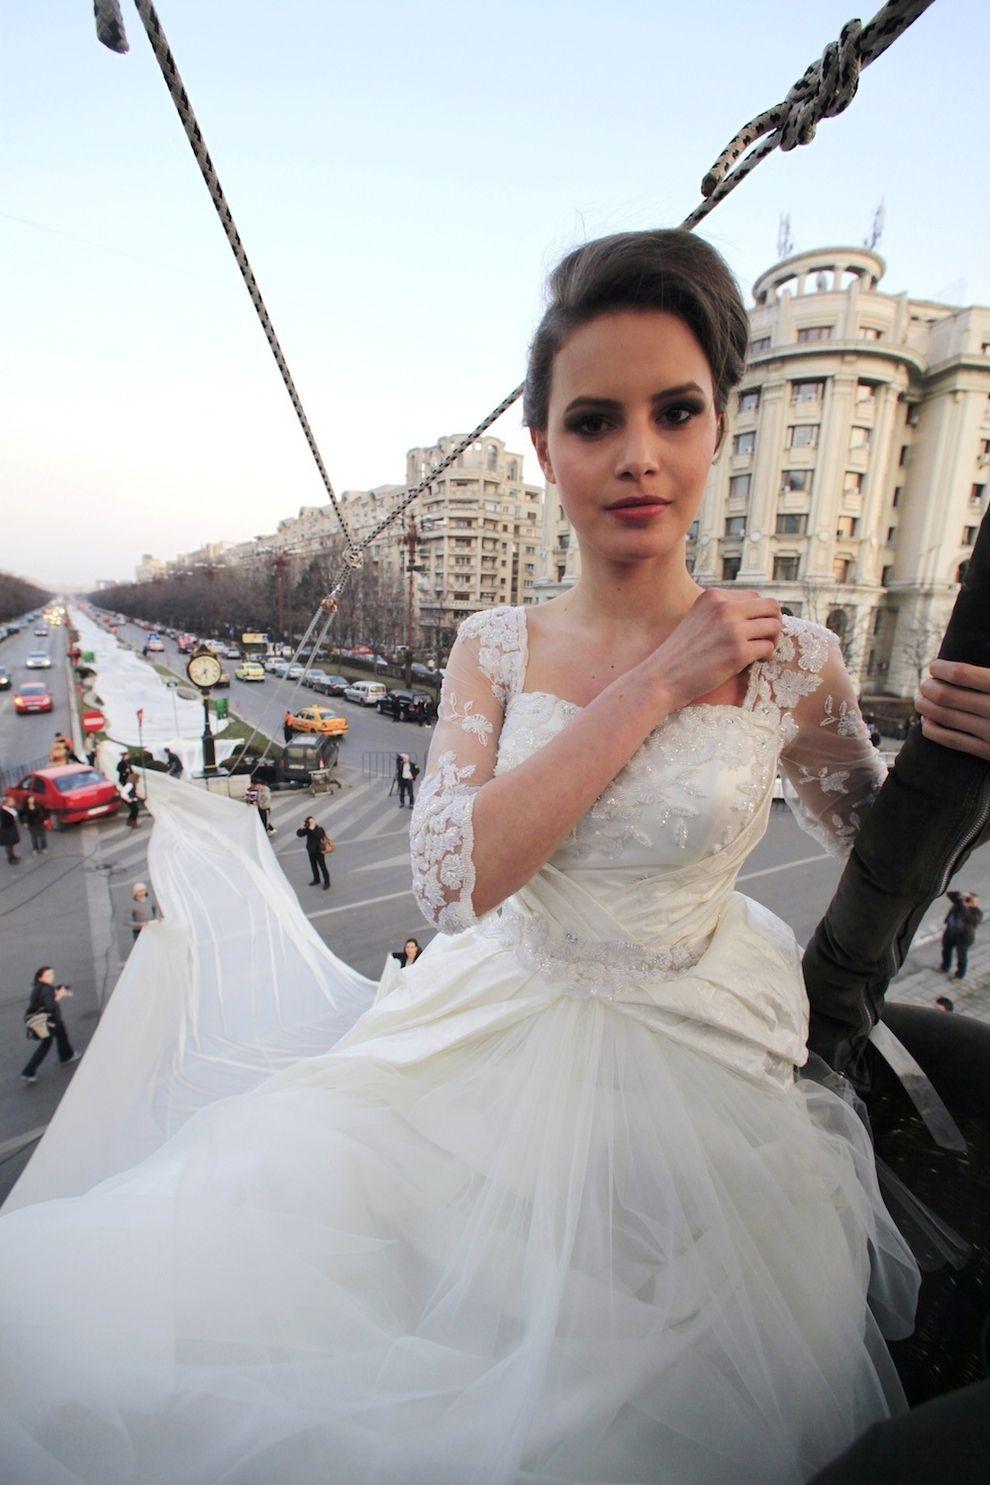 World's Longest WeddingDress